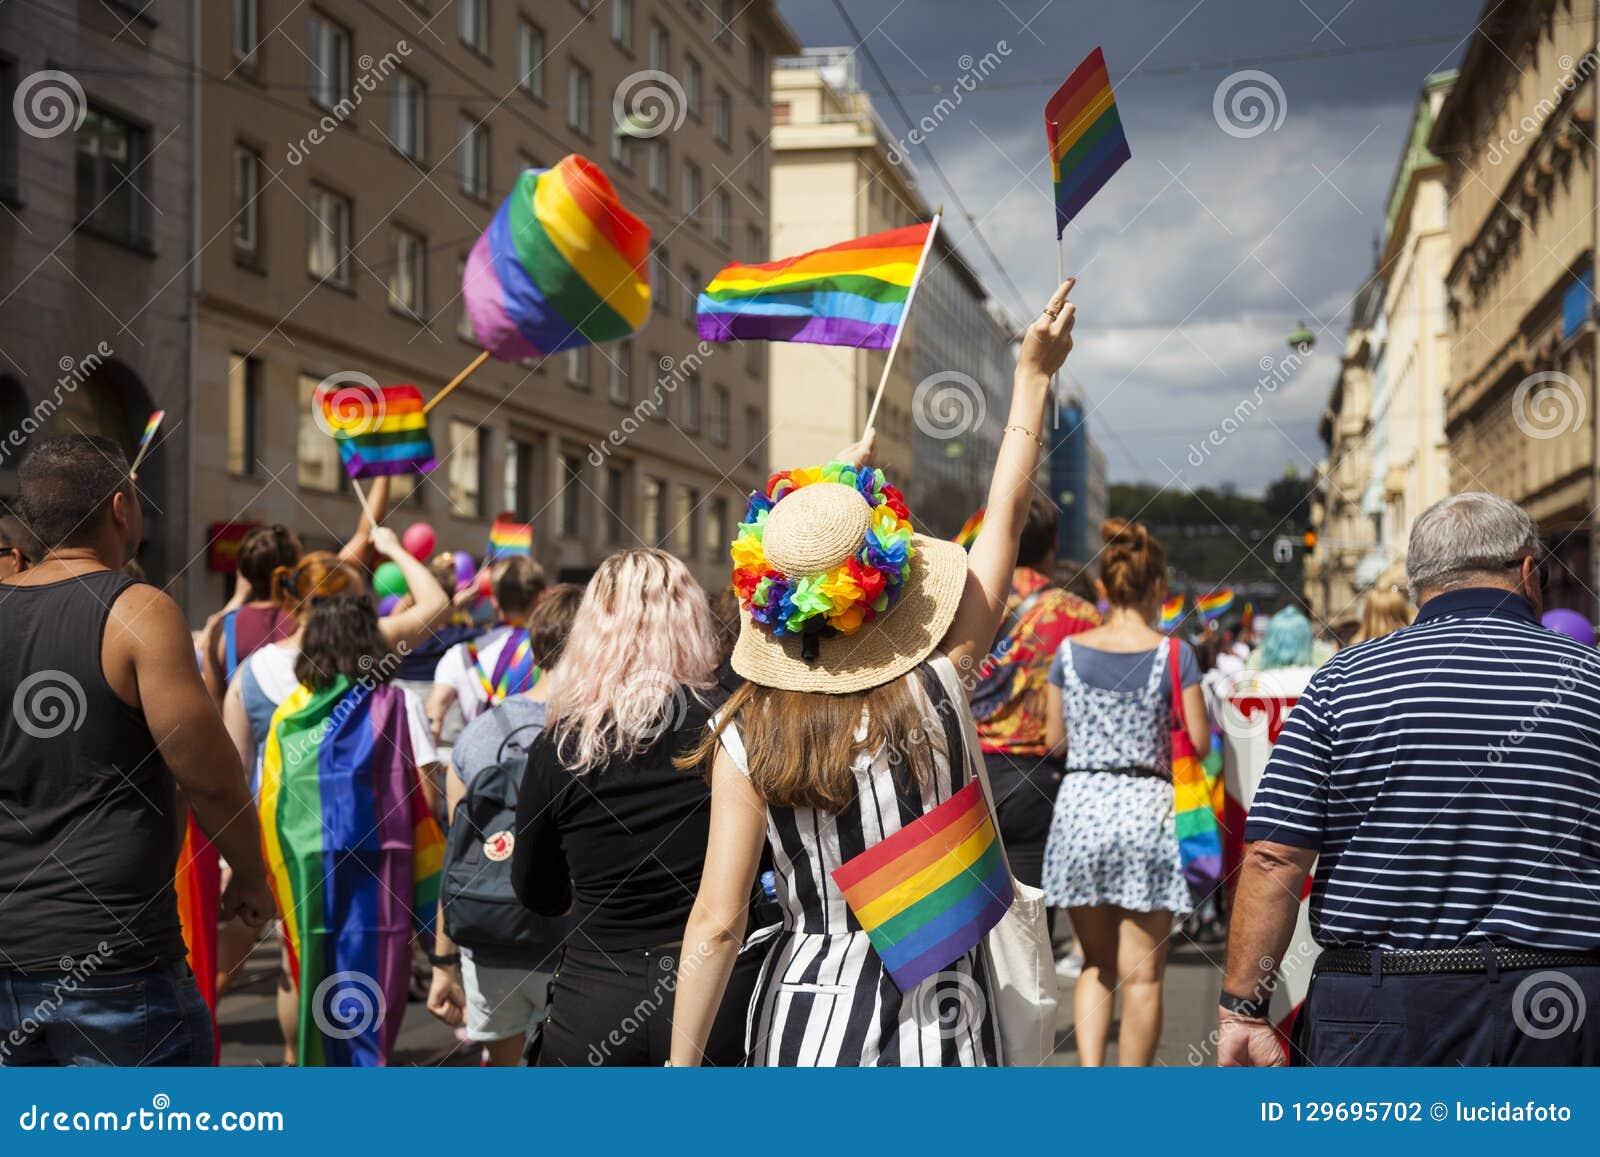 Prague/Czech Republic -August 11. 2018 : LGBT Pride March